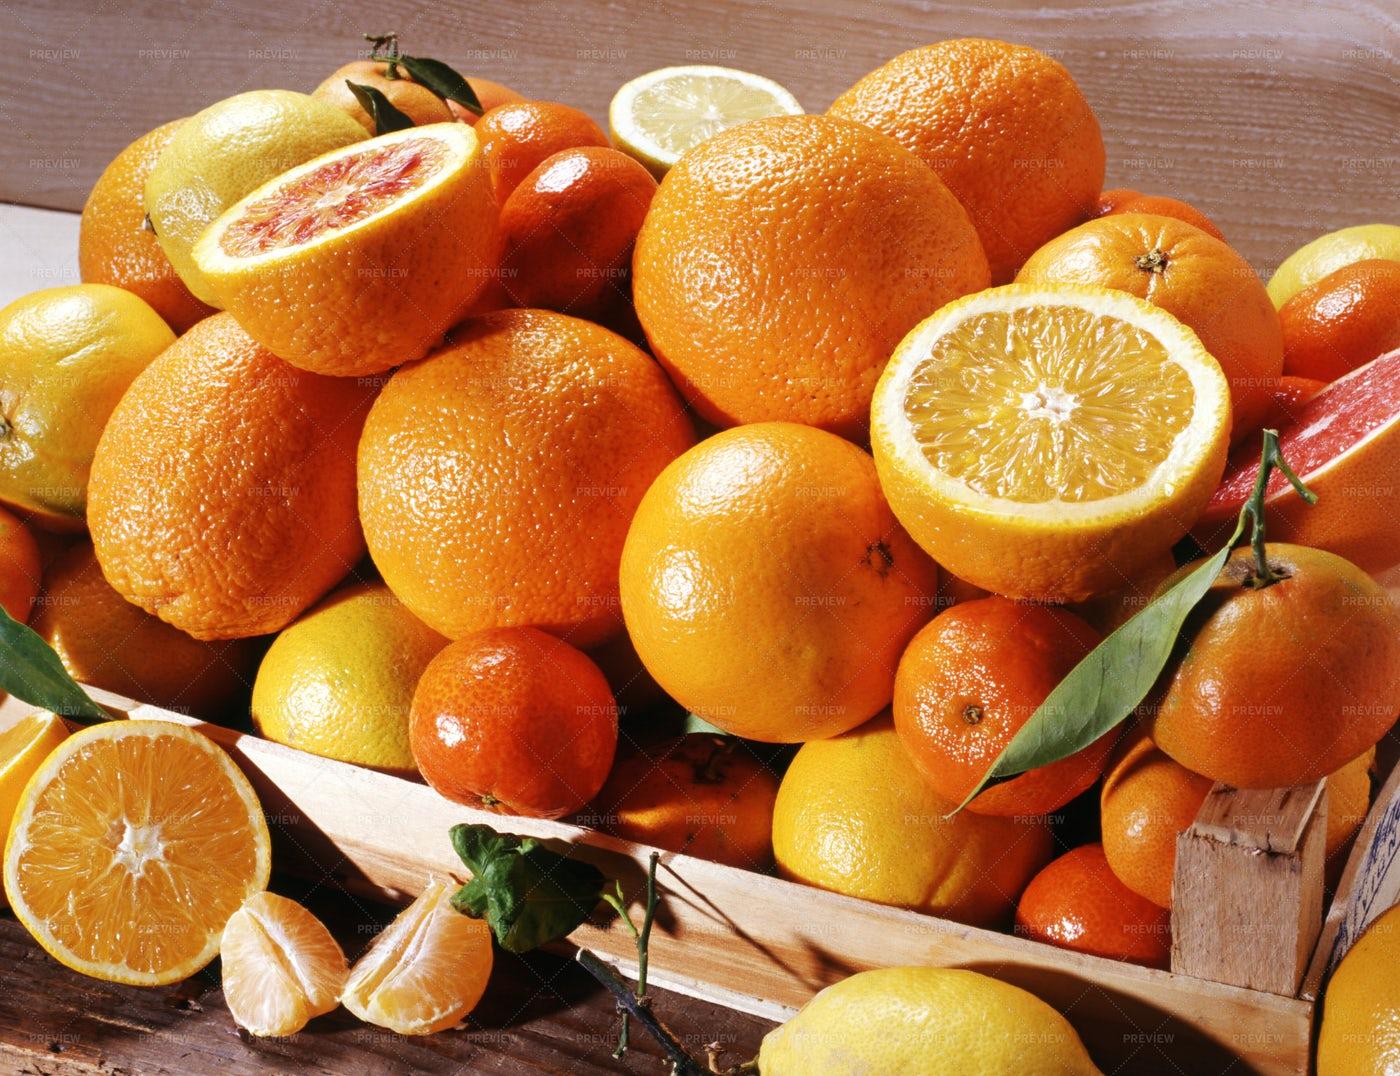 Box Of Oranges: Stock Photos